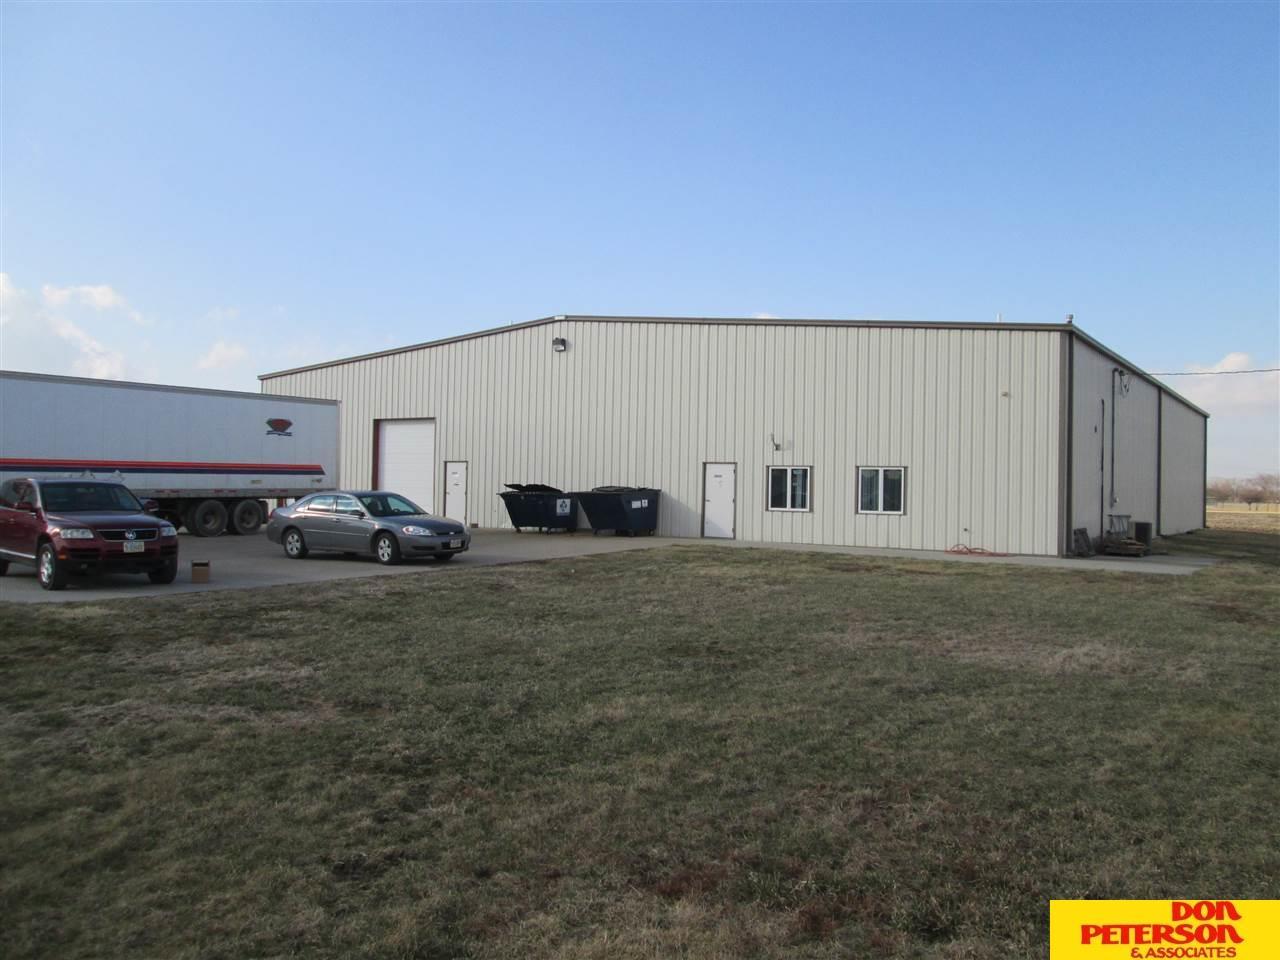 2860 W 23rd Dr, Fremont, NE 68025